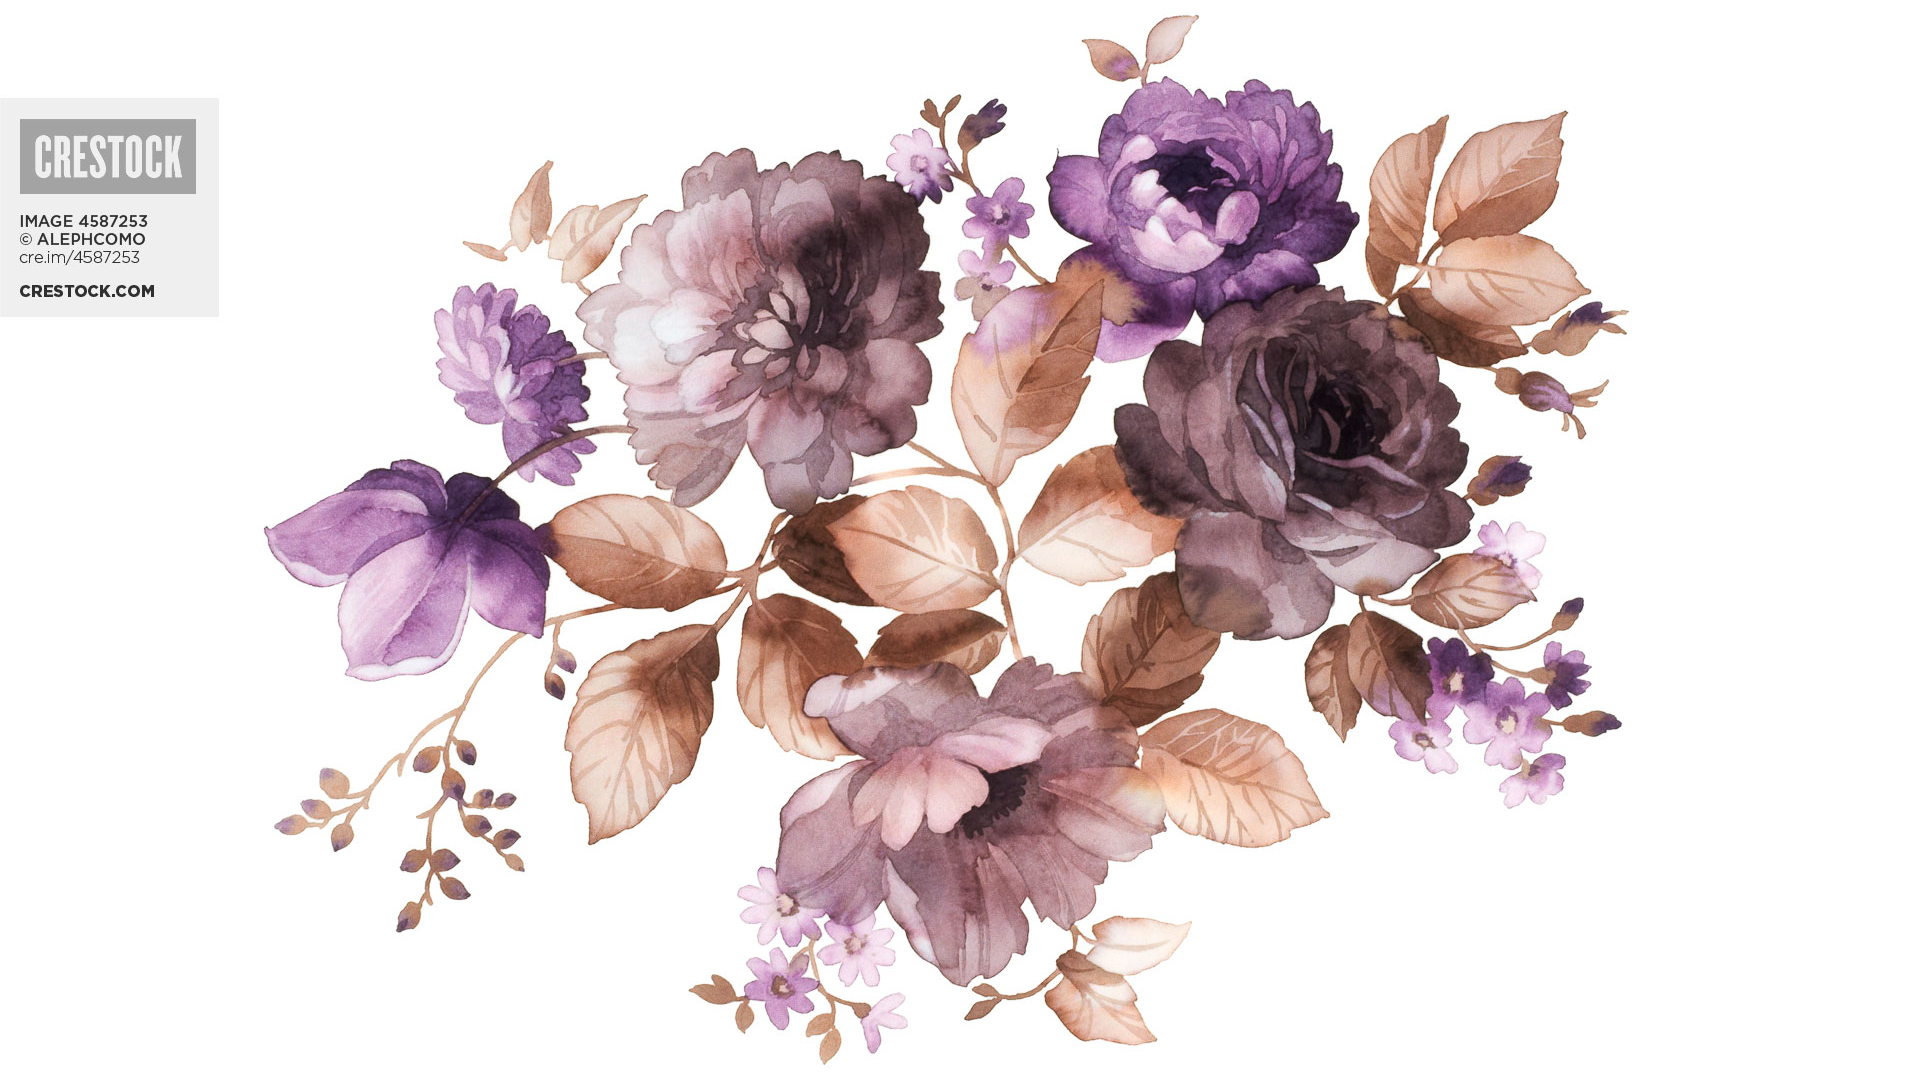 Free Download Wallpaper From Crestock Watercolor Flowers Blog